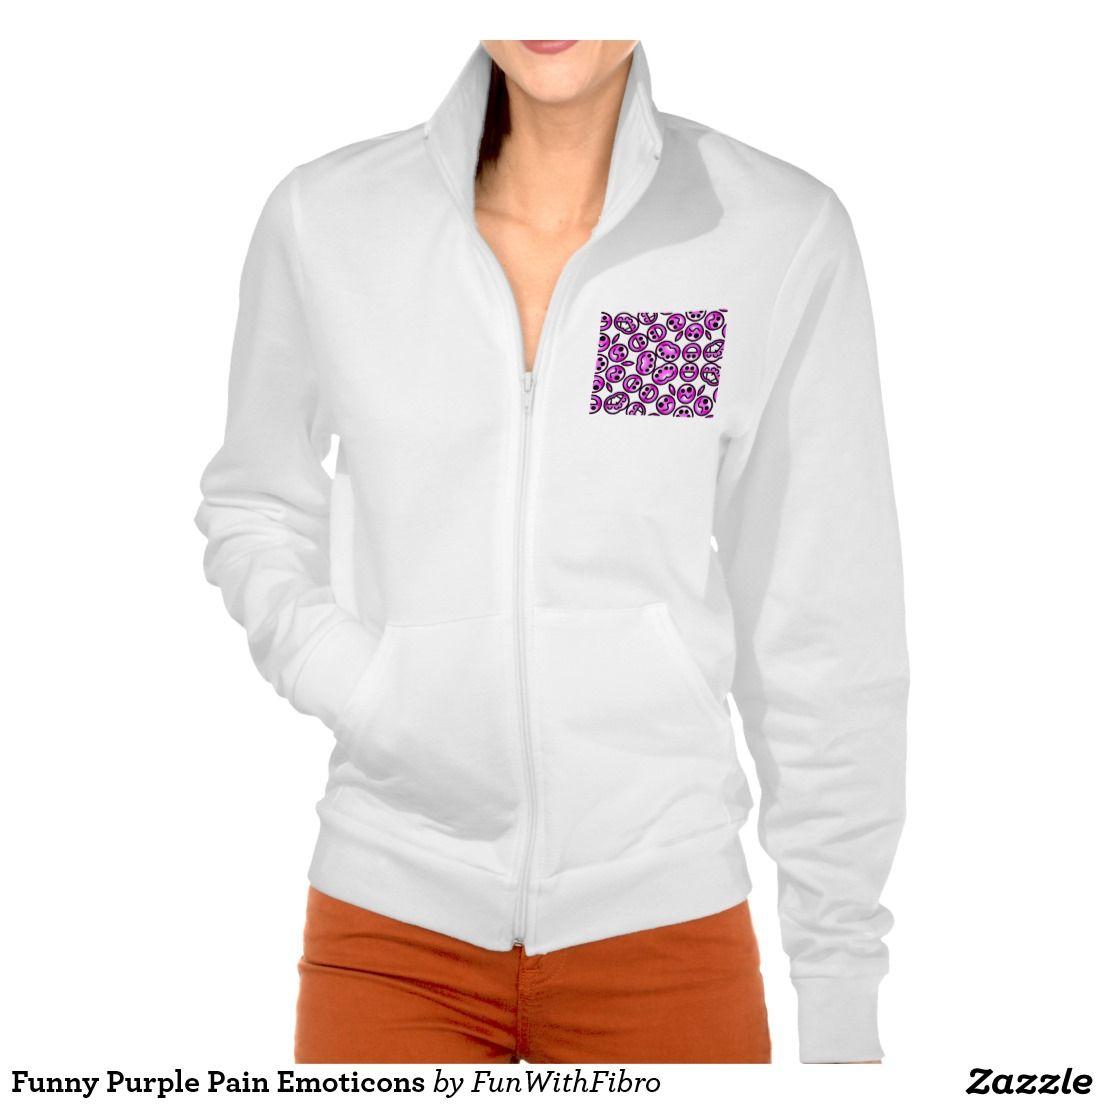 Funny Purple Pain Emoticons Printed Jacket